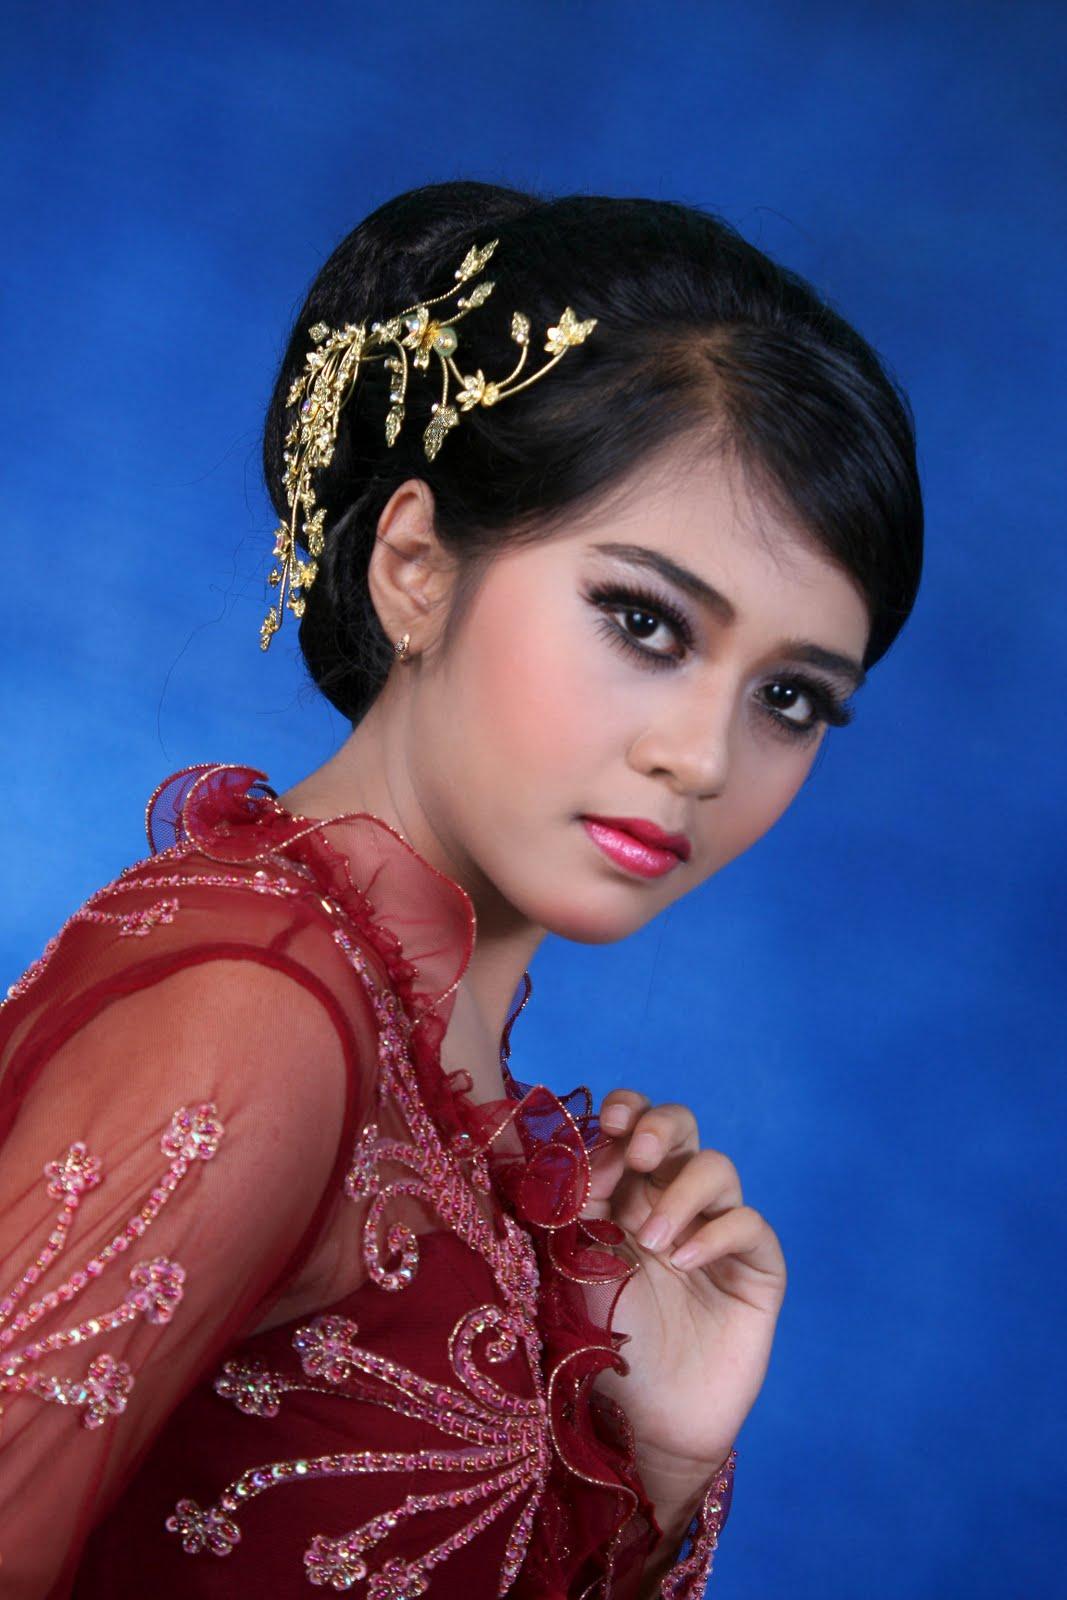 Rias Pengantin Muslim Dan Adat Sunda Modern Wilujeng Sumping Di, rias ...